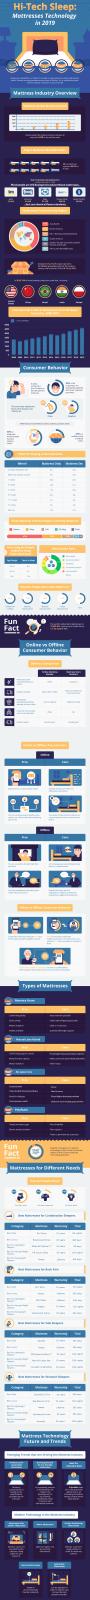 Mattress Industry Infographic